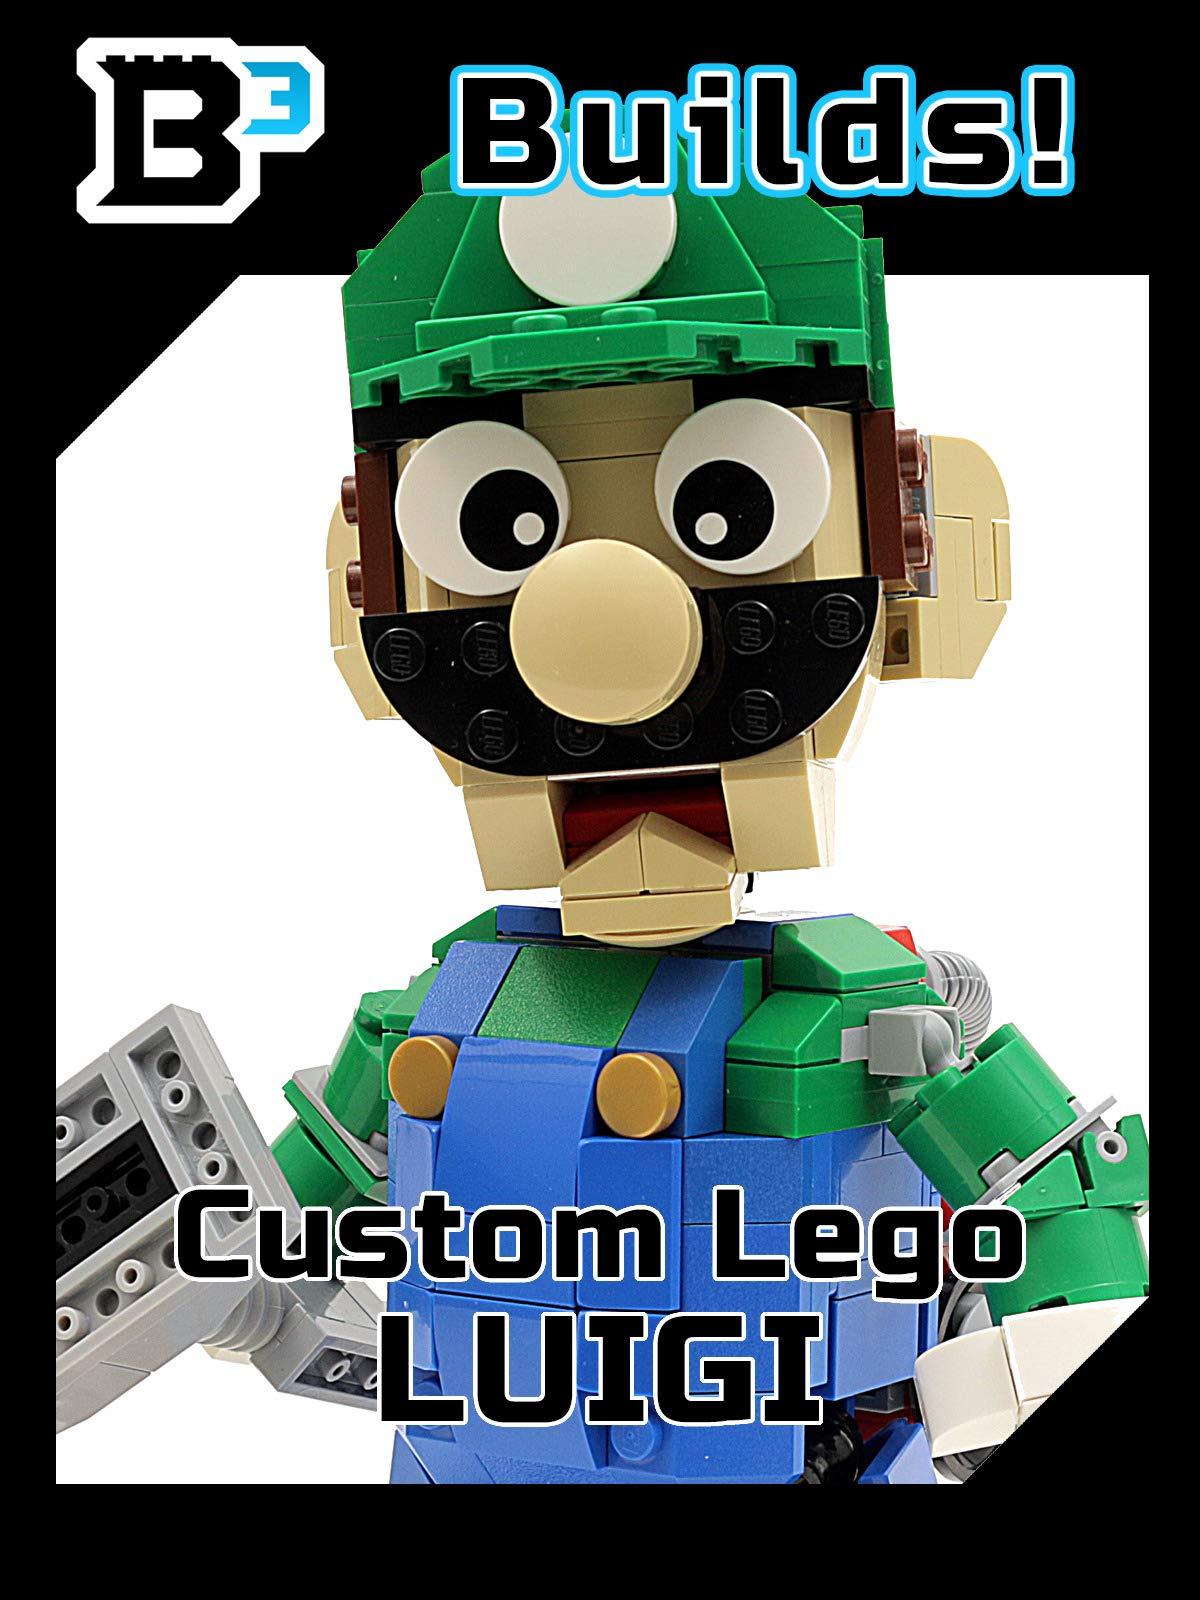 B3 Builds! Custom LEGO Luigi Figure